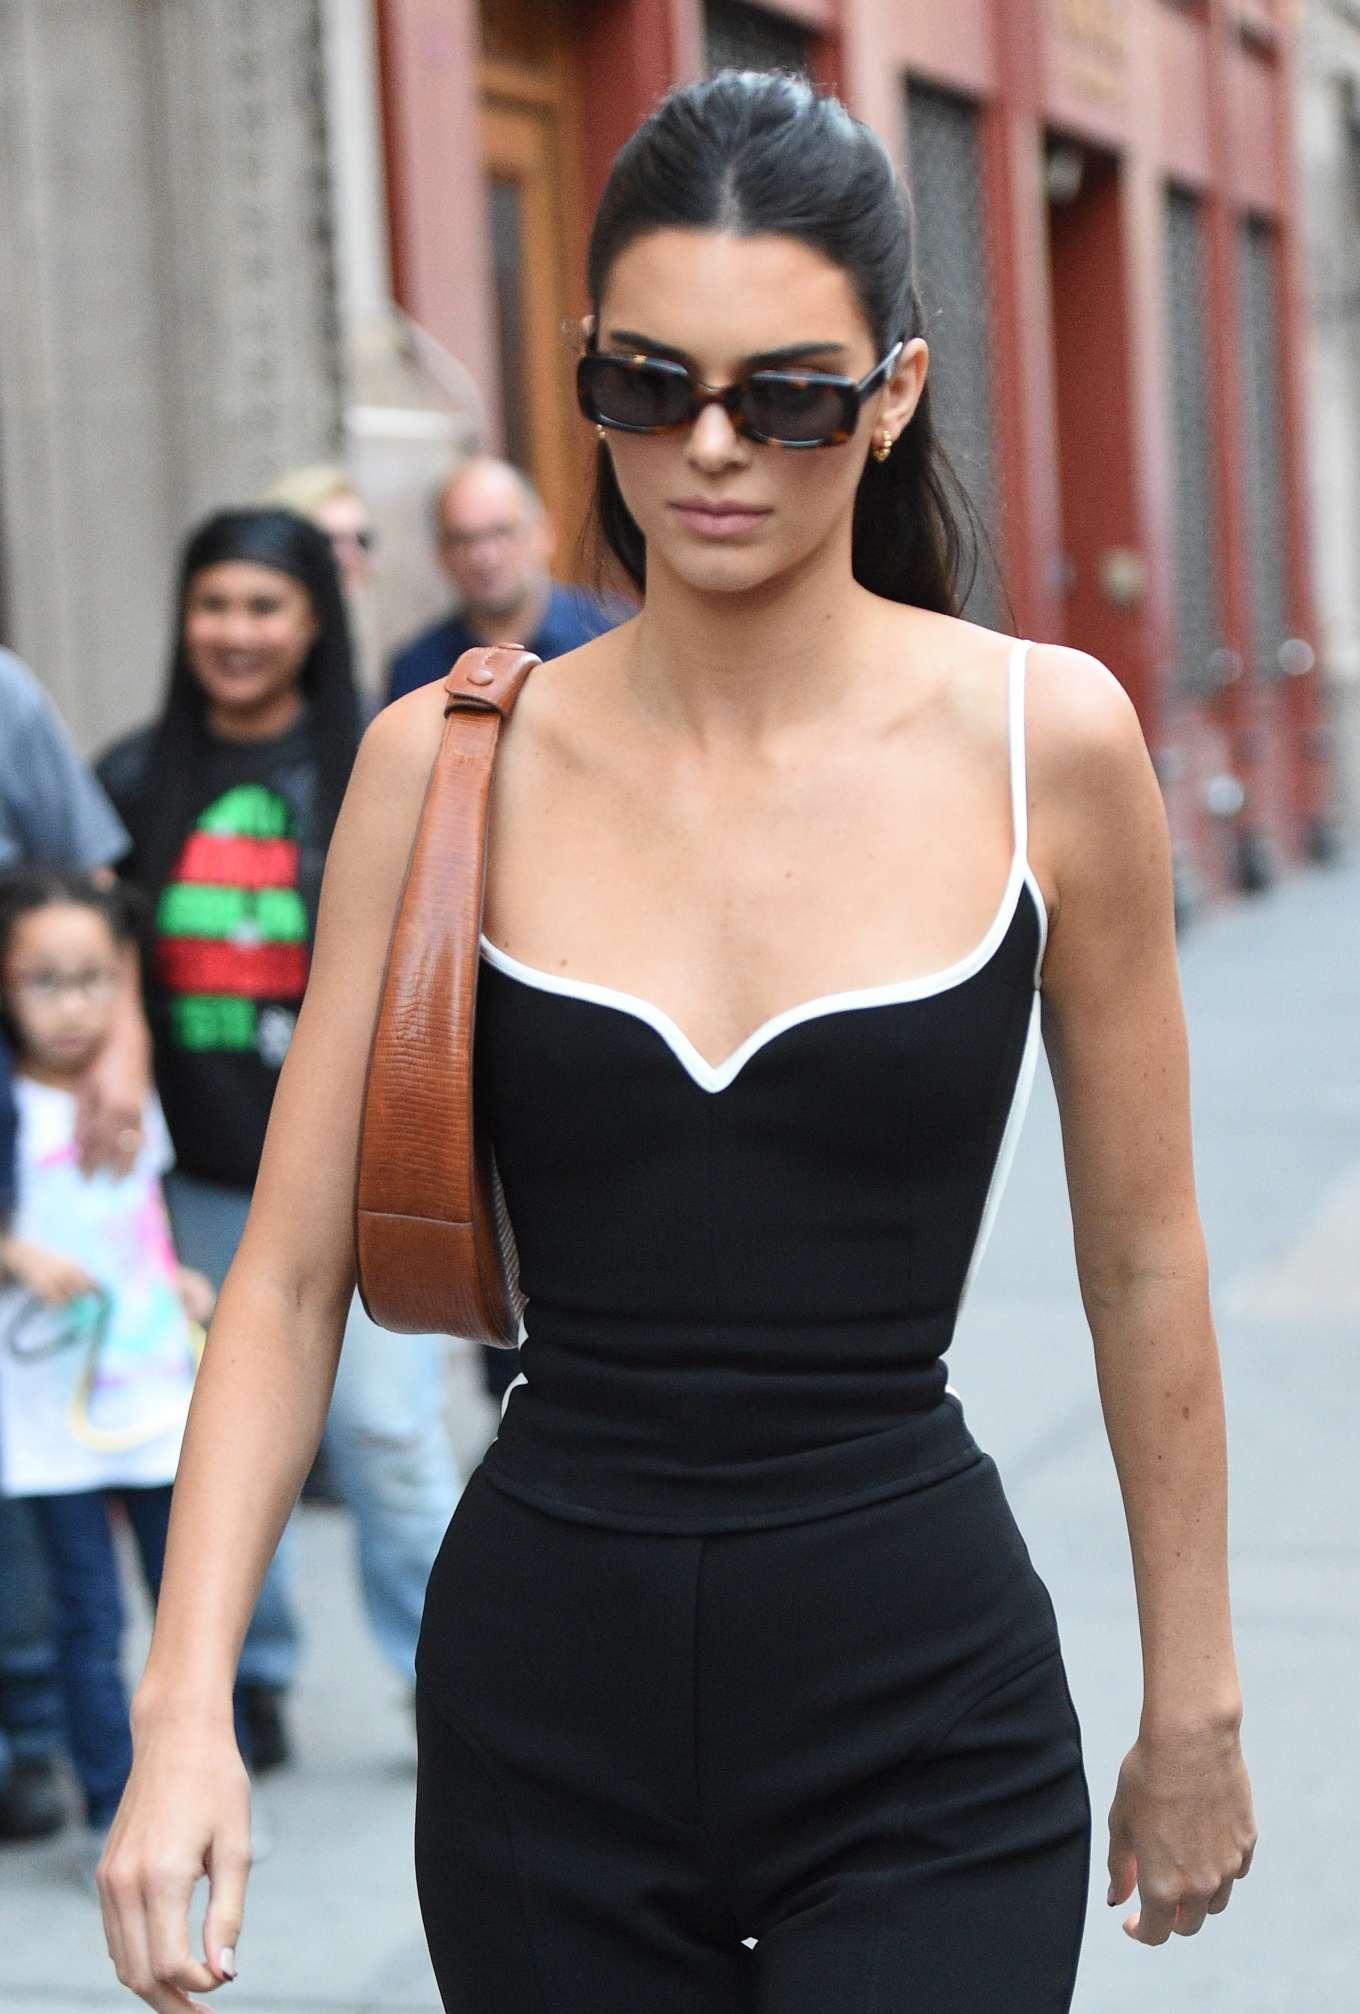 Kendall Jenner - Walking around in Soho, New York